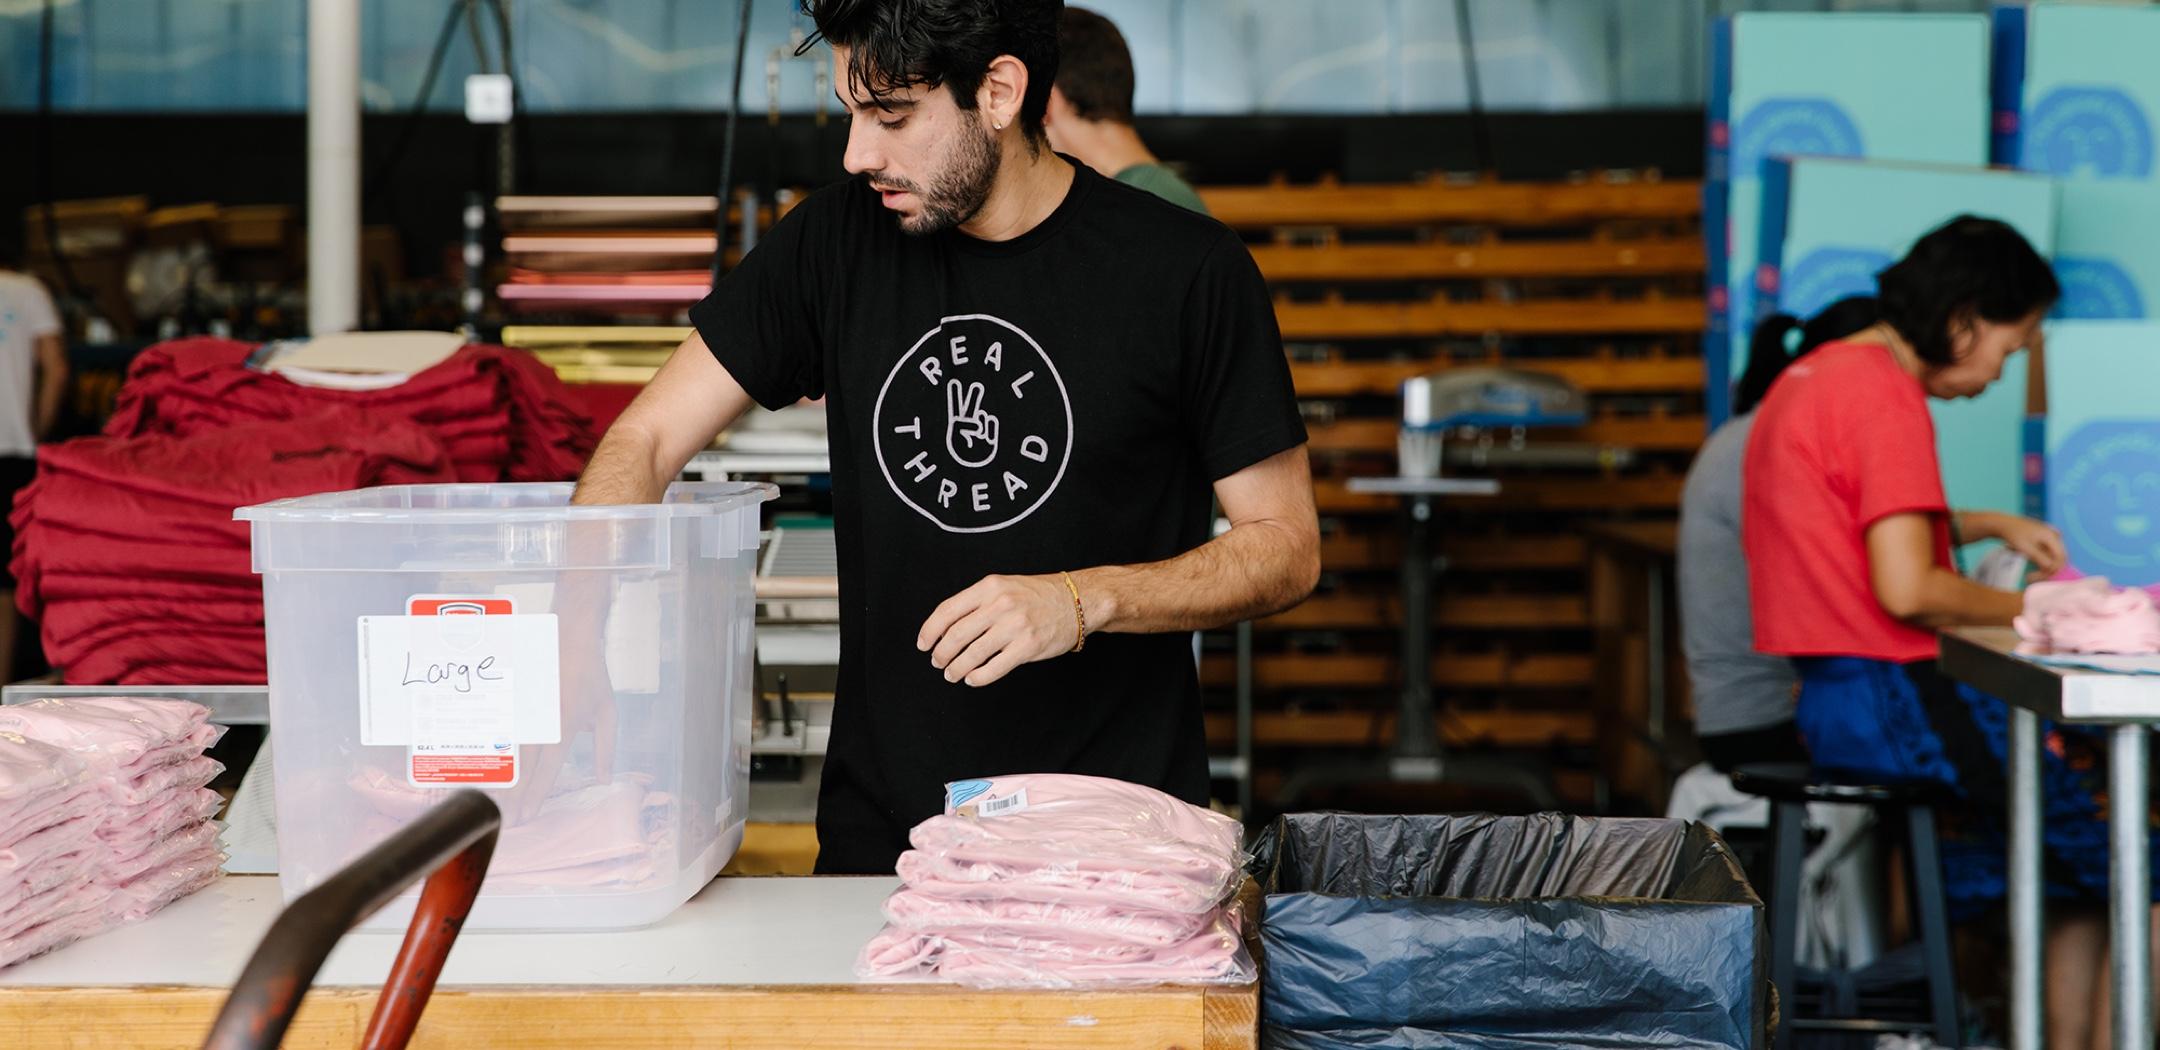 A man starts packaging an order of custom t-shirts.